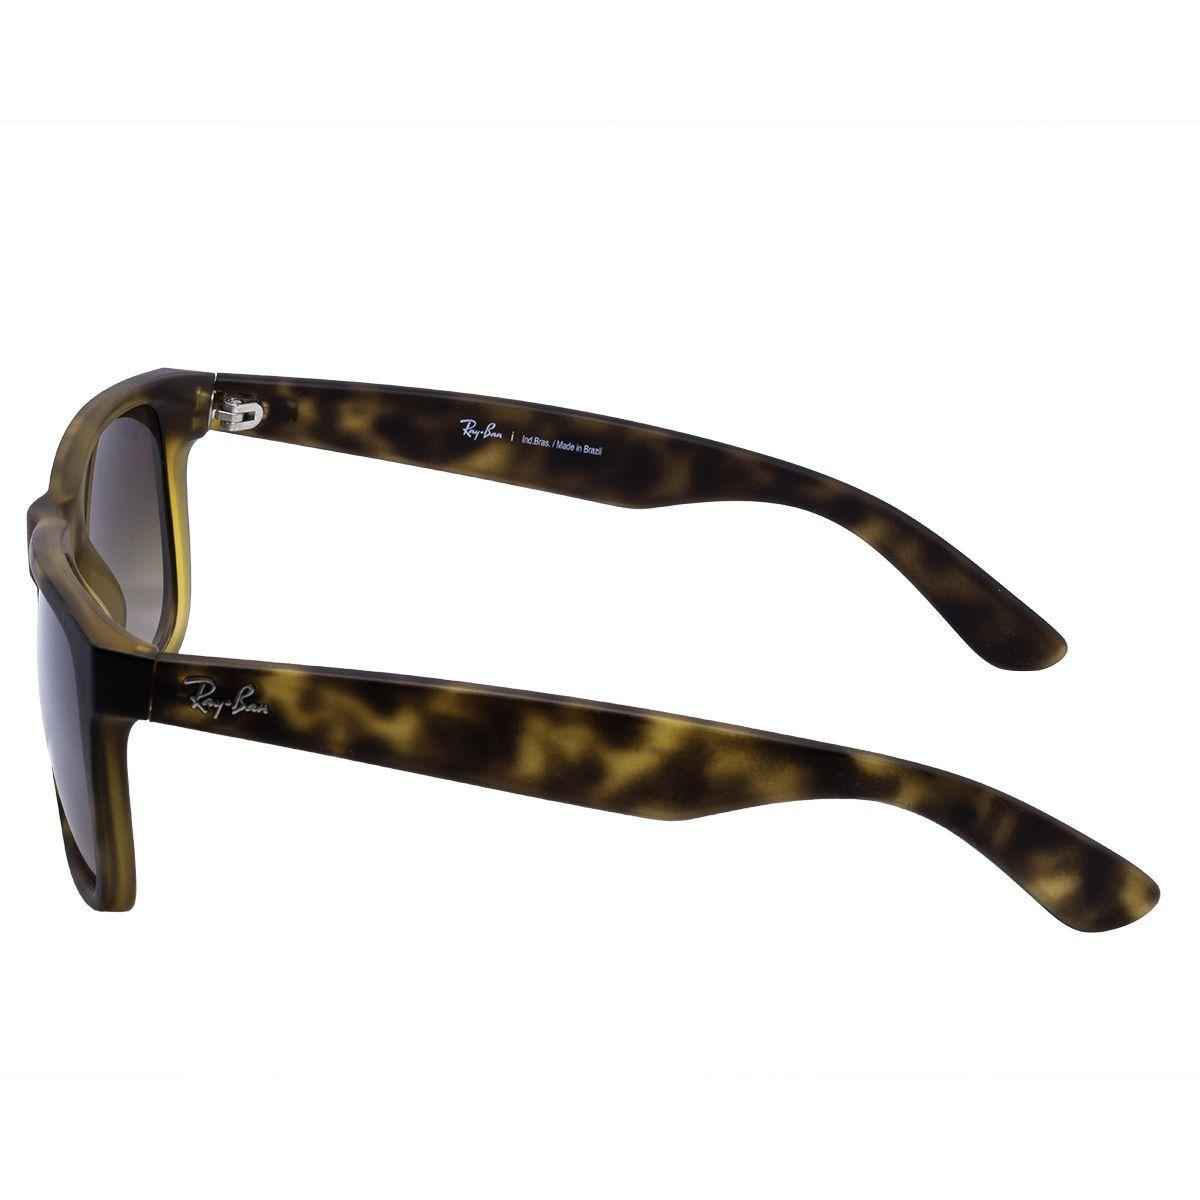 1481b40df8 Óculos de Sol Ray Ban Justin Rubber Matte Havana RB4165 710 13 - Acetato  Tartaruga